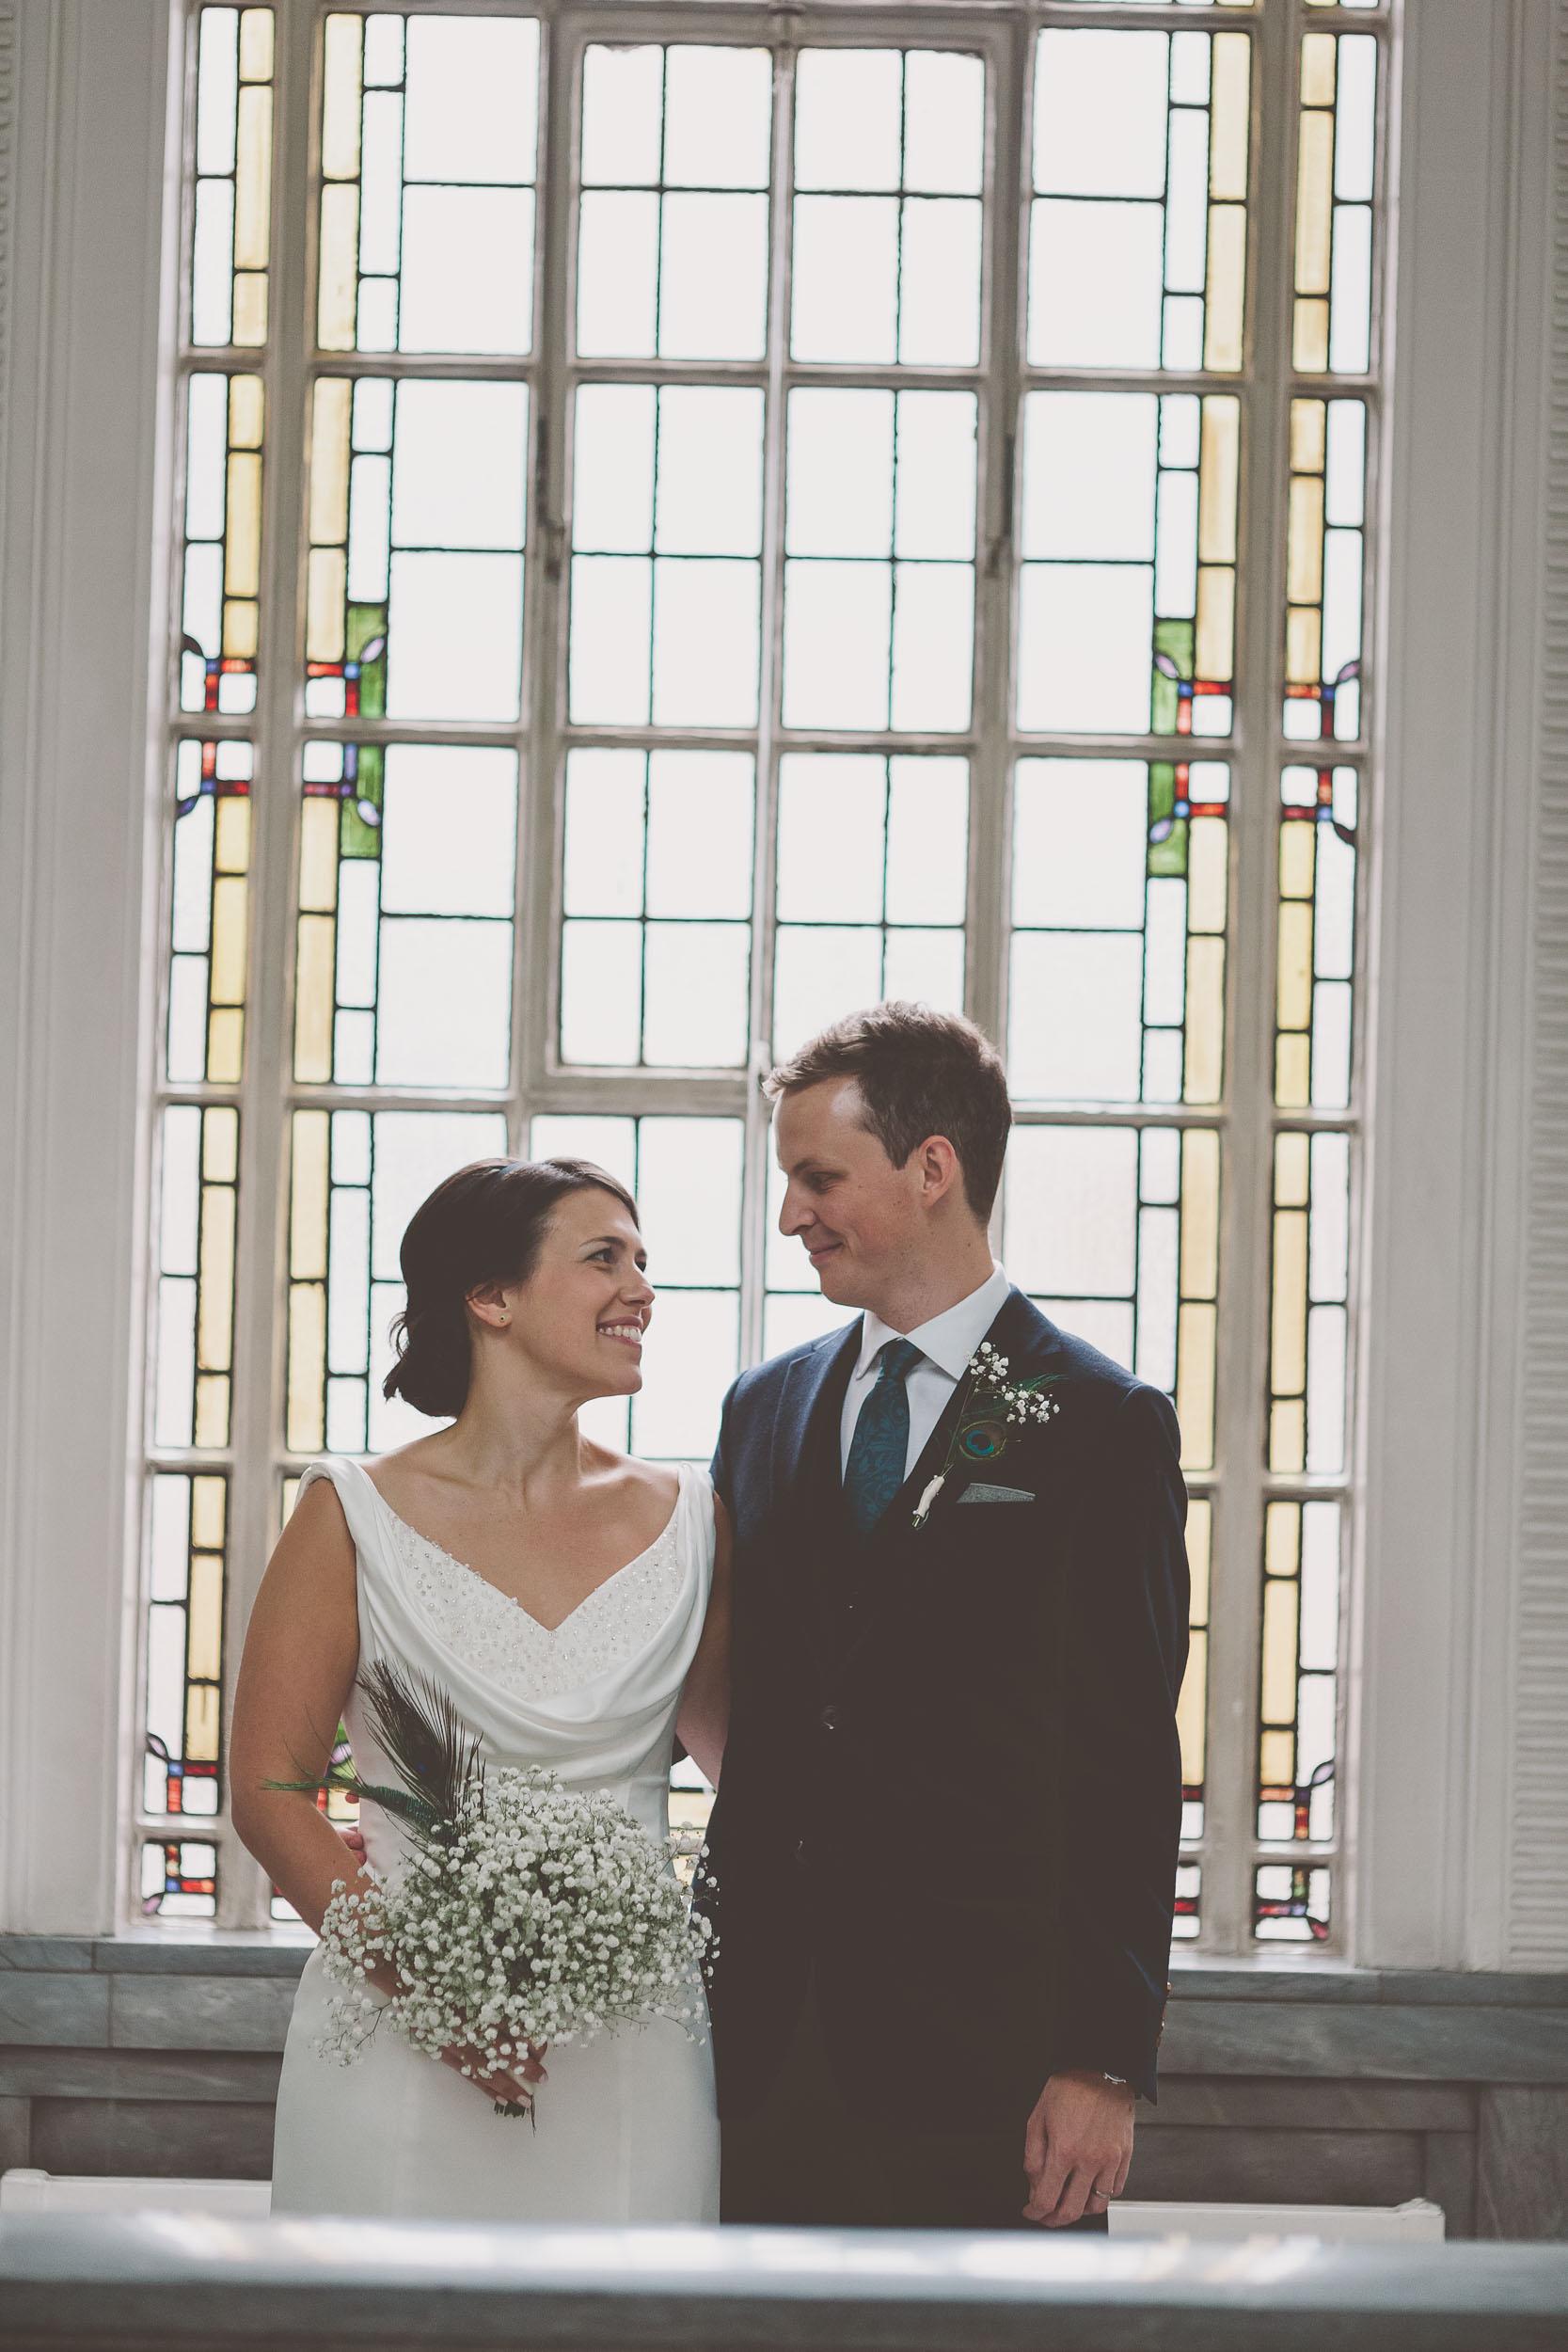 islington-town-hall-4th-floor-studios-wedding137.jpg